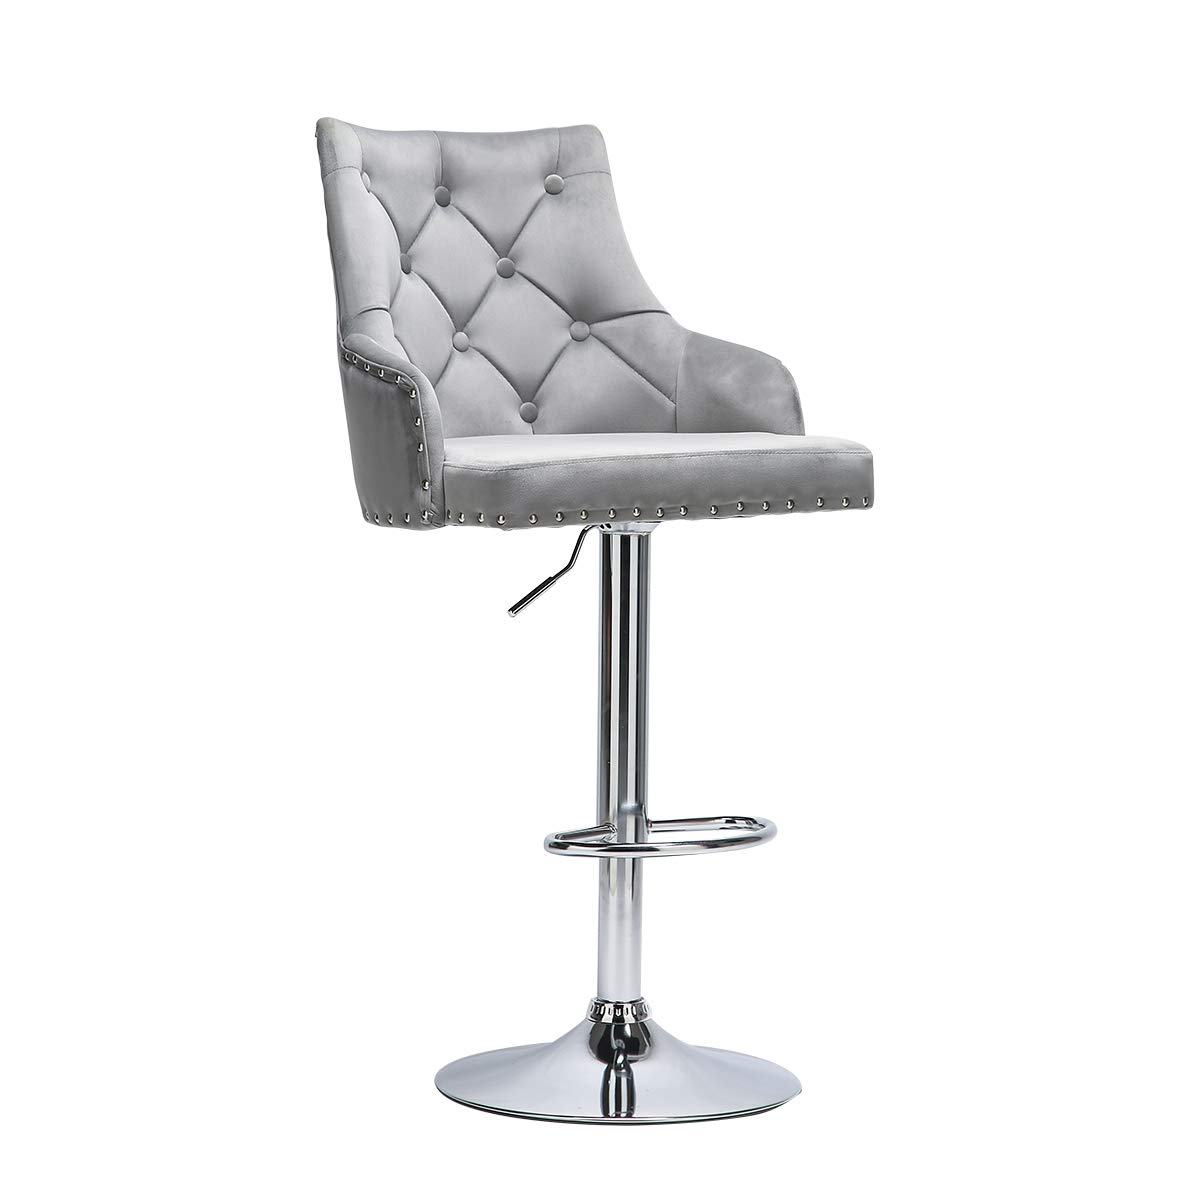 Vanimeu Bar Chair Velvet Grey, Height Adjustable Bar Stools with Backrest,  3° Swivel Gas Lift Kitchen Chair, Chrome